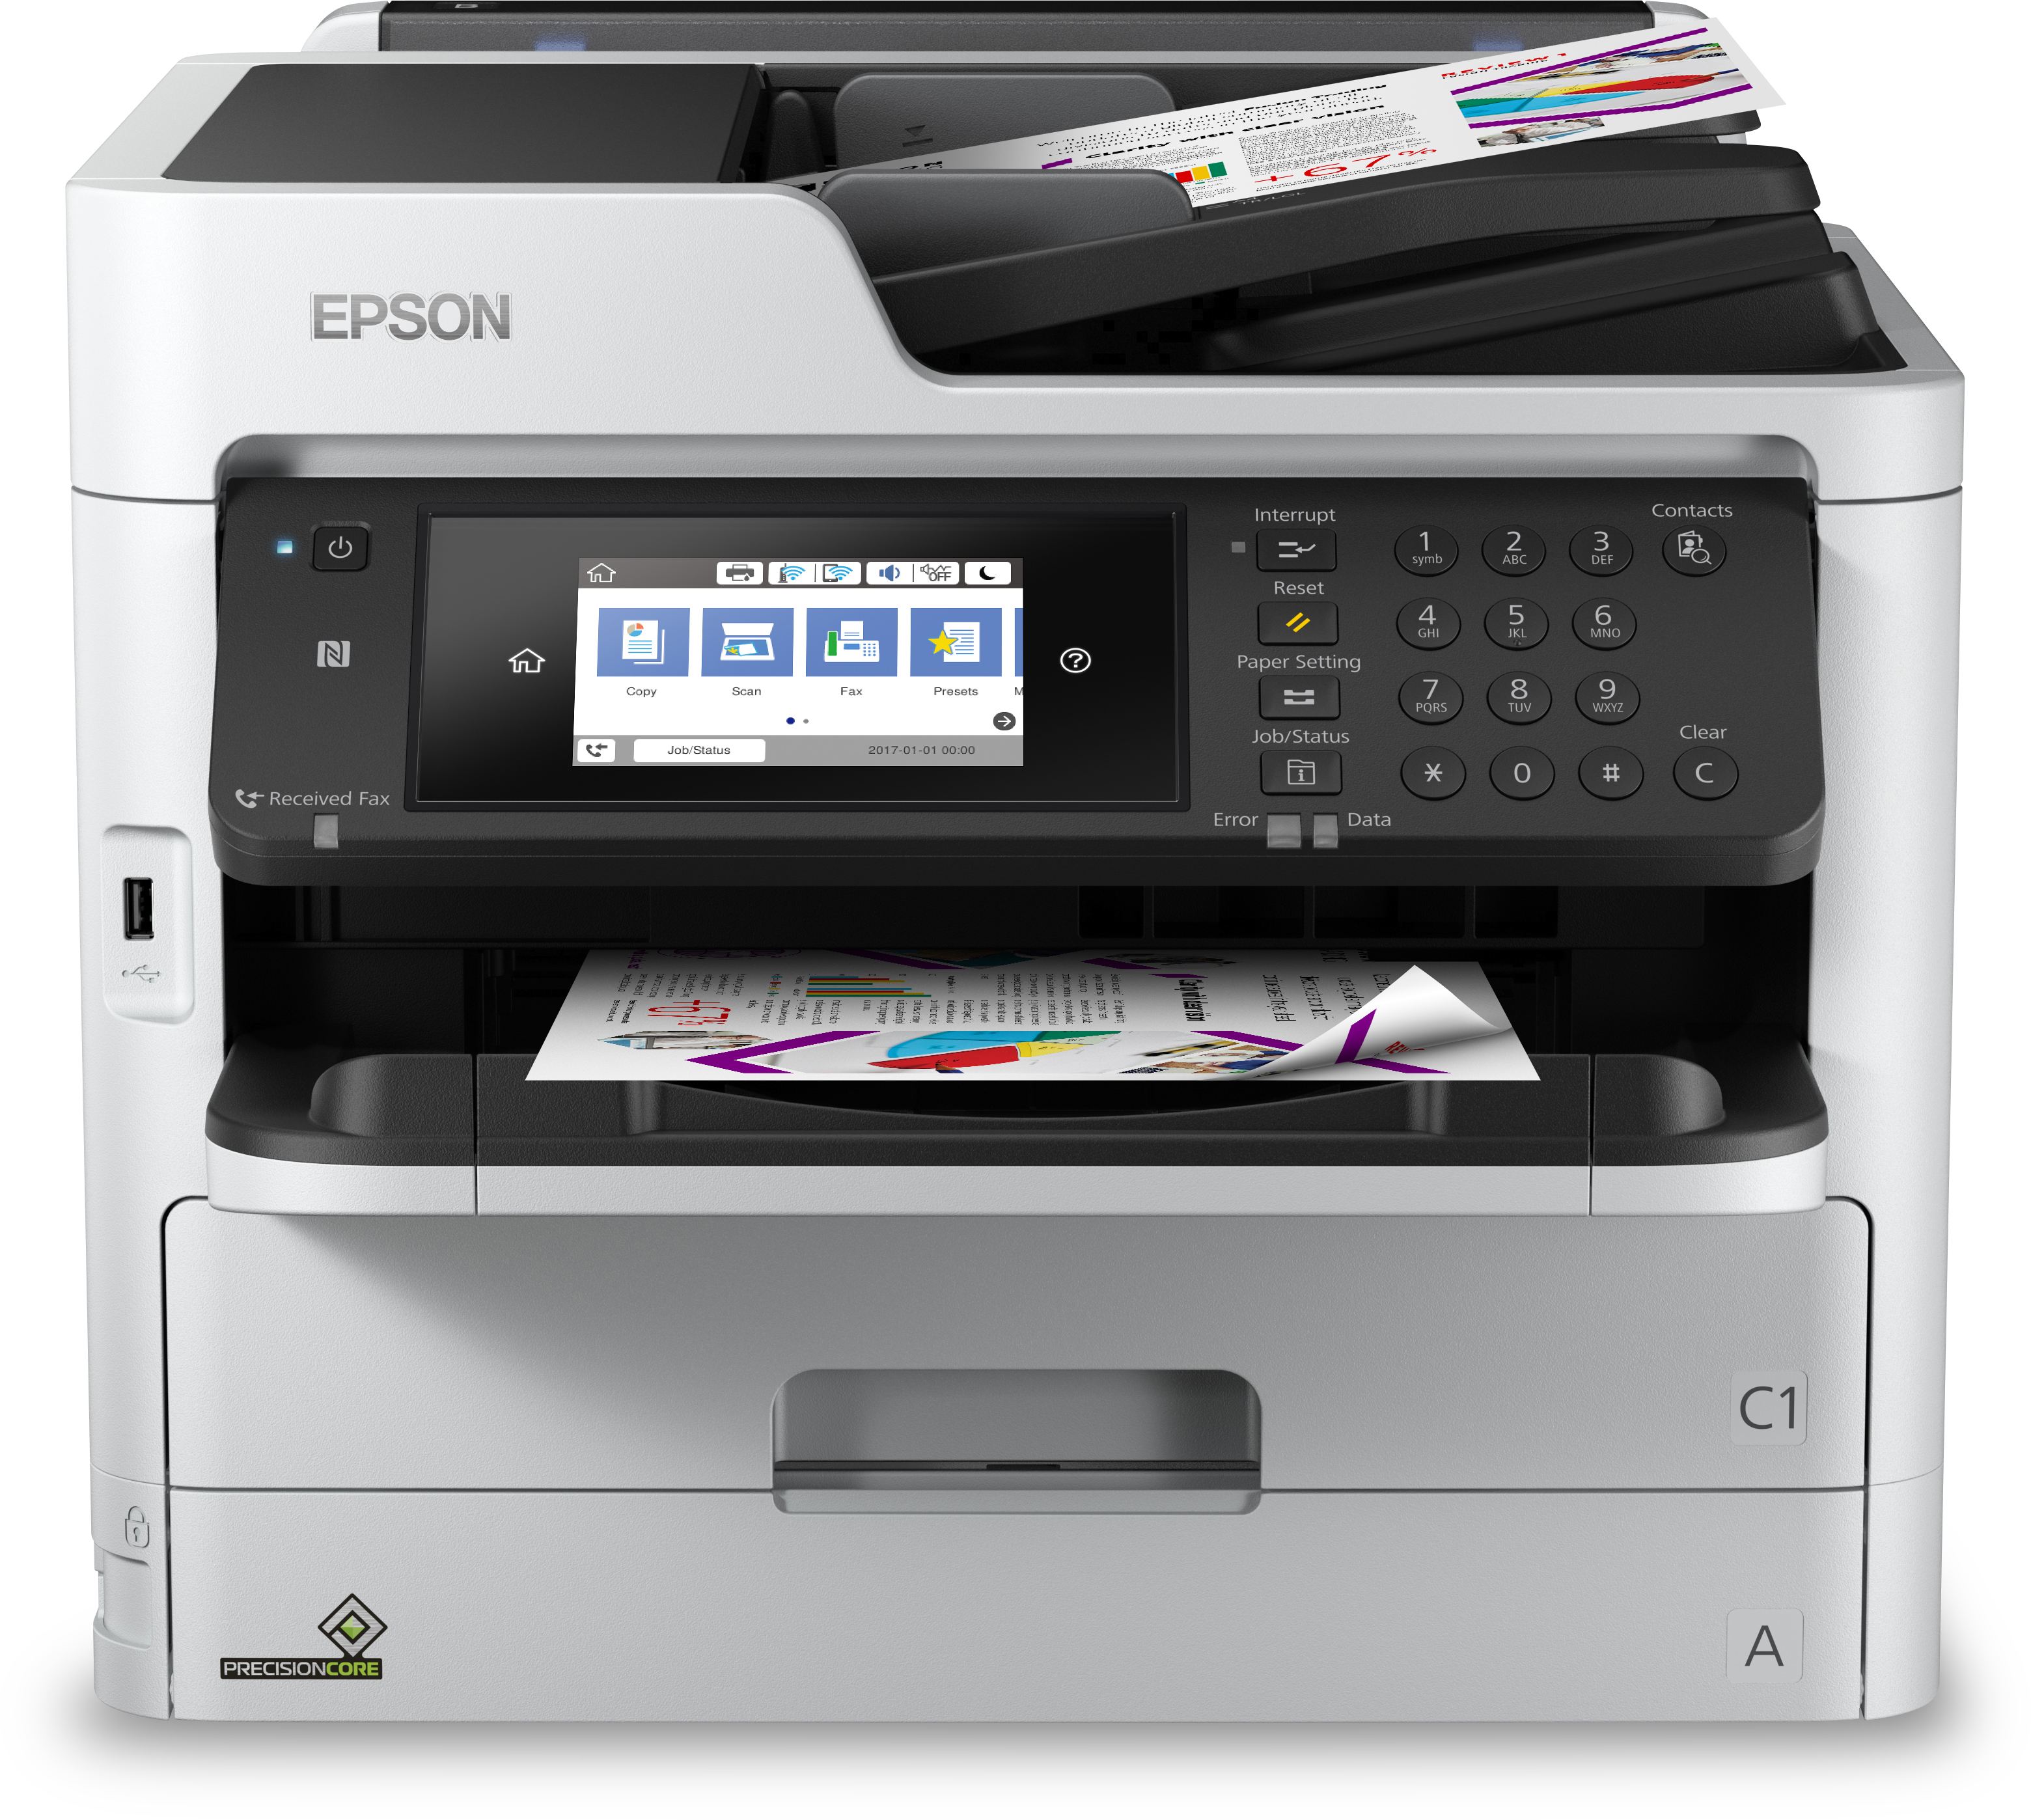 Noleggio Multifunzione WorkForce Pro WF-C5790DWF - Lyreco print services